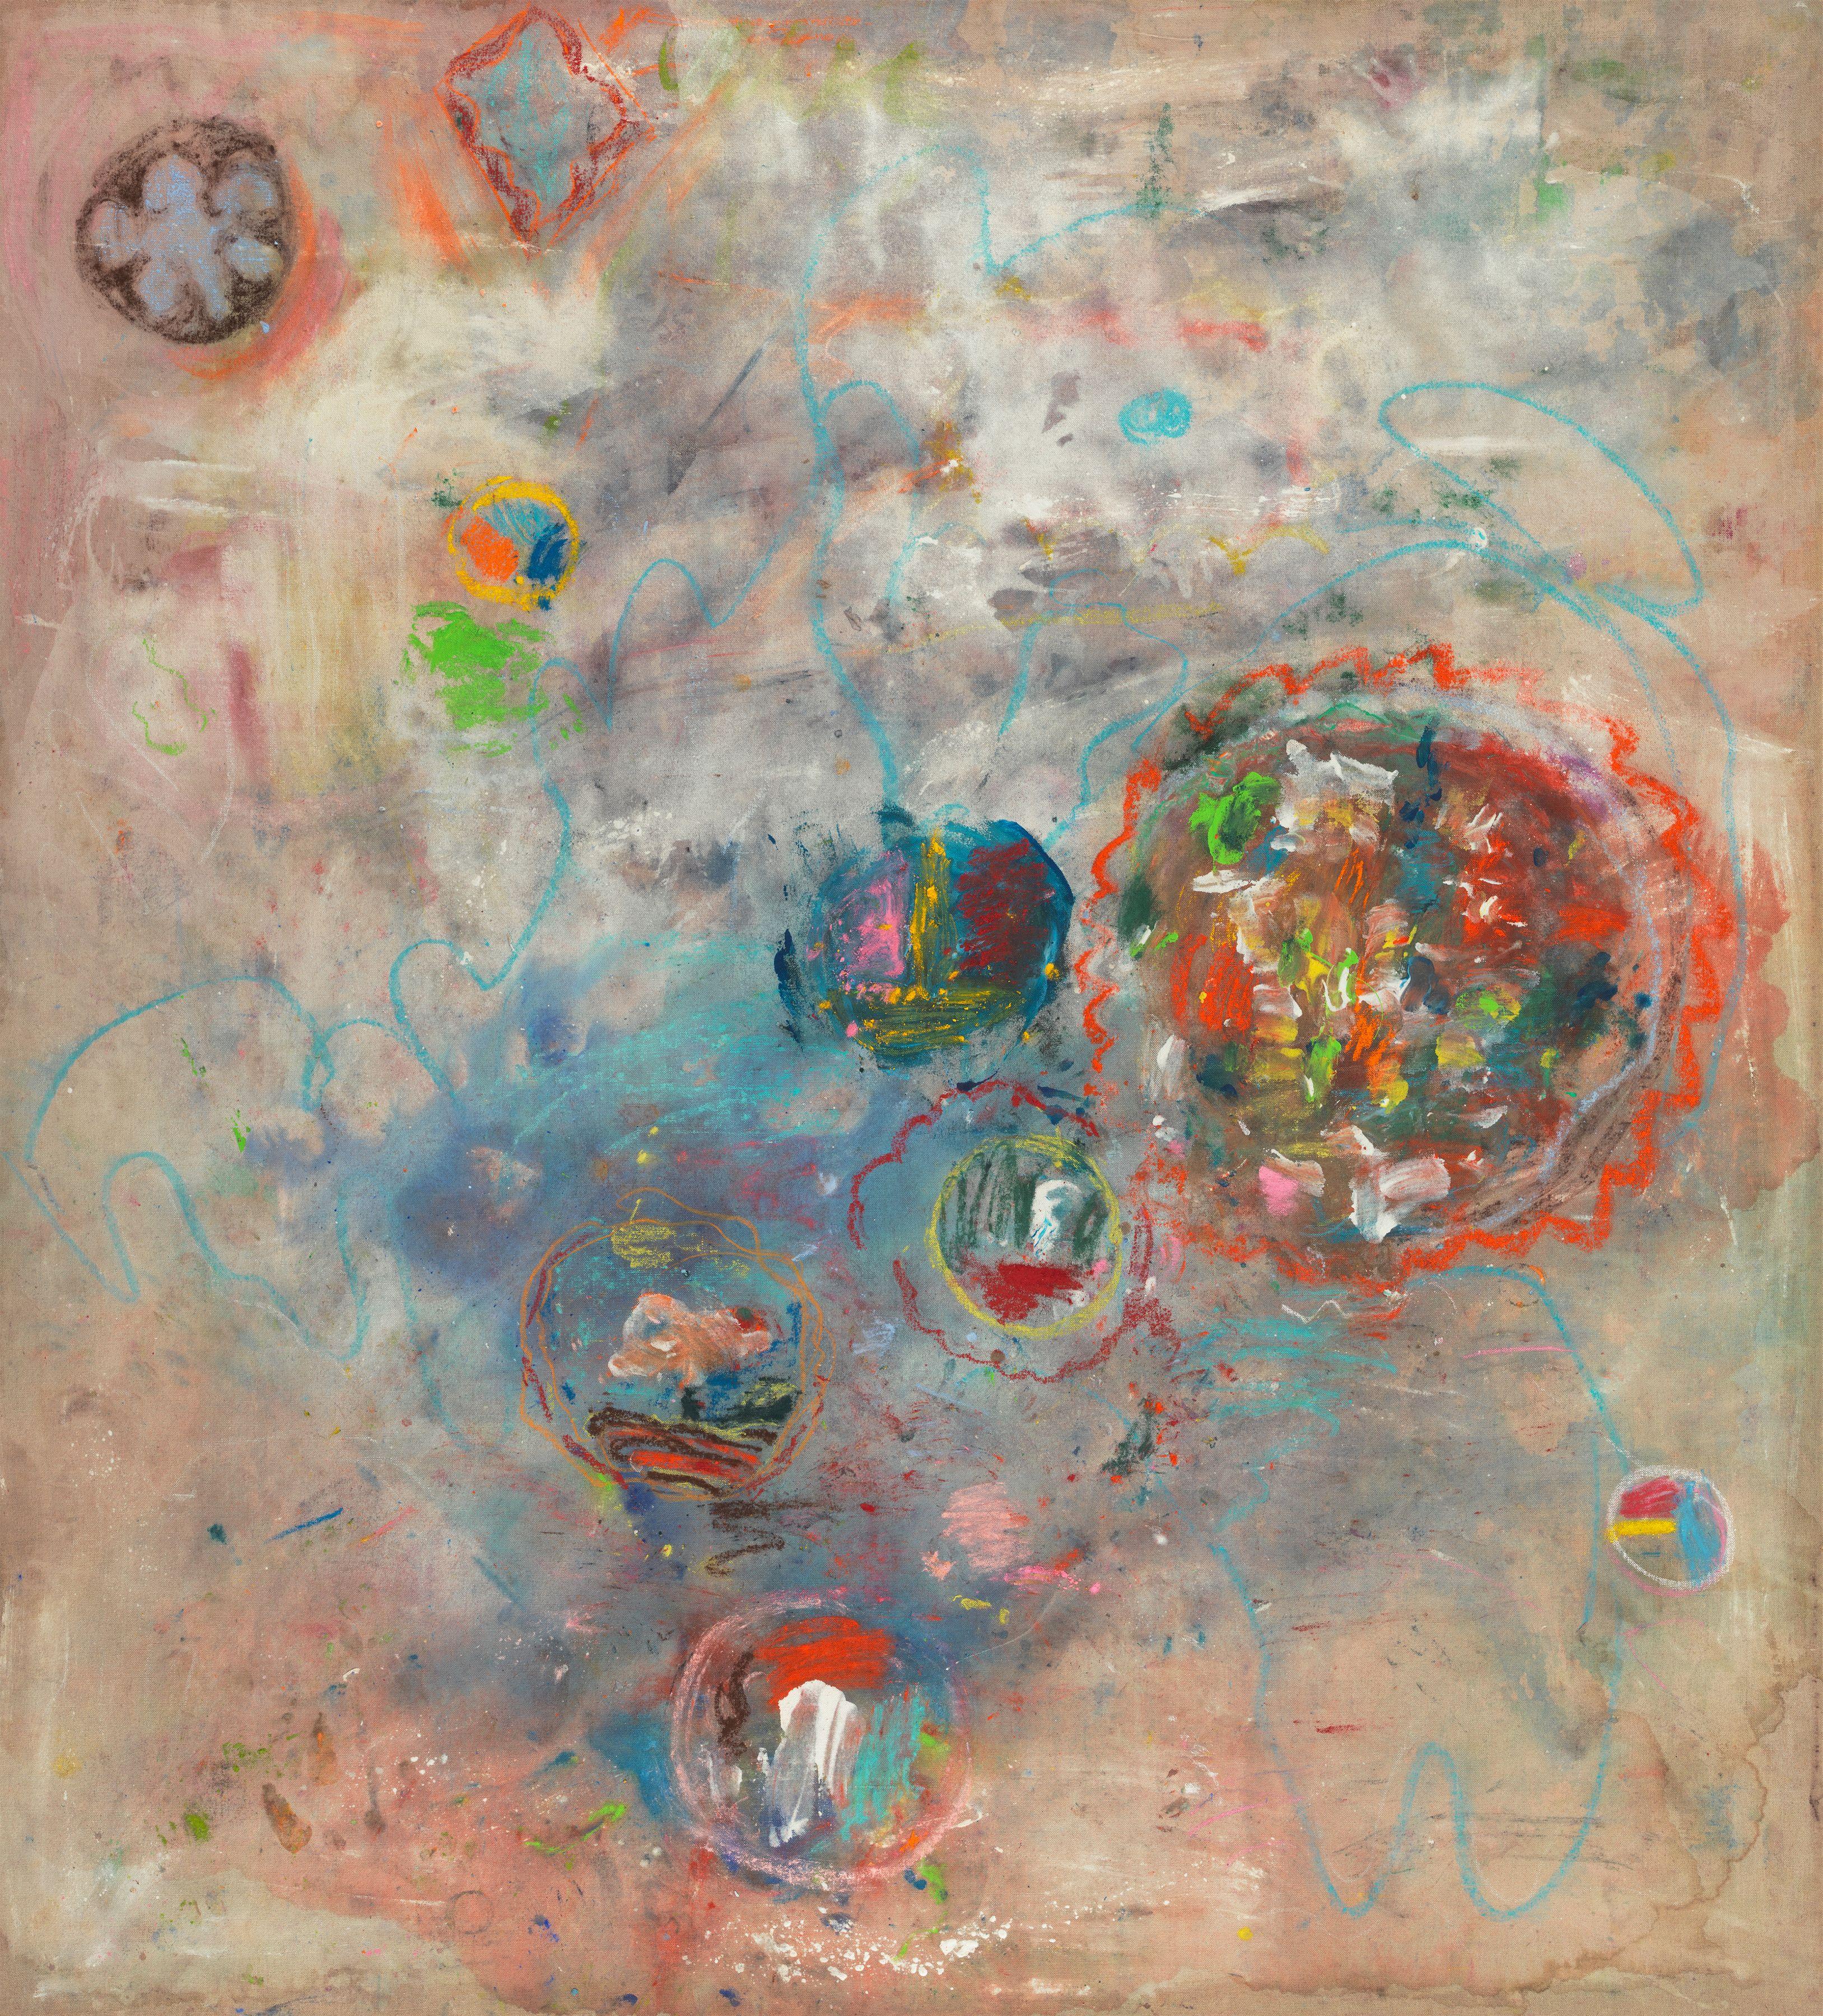 Bild, 2004, Pigment and pastel on canvas